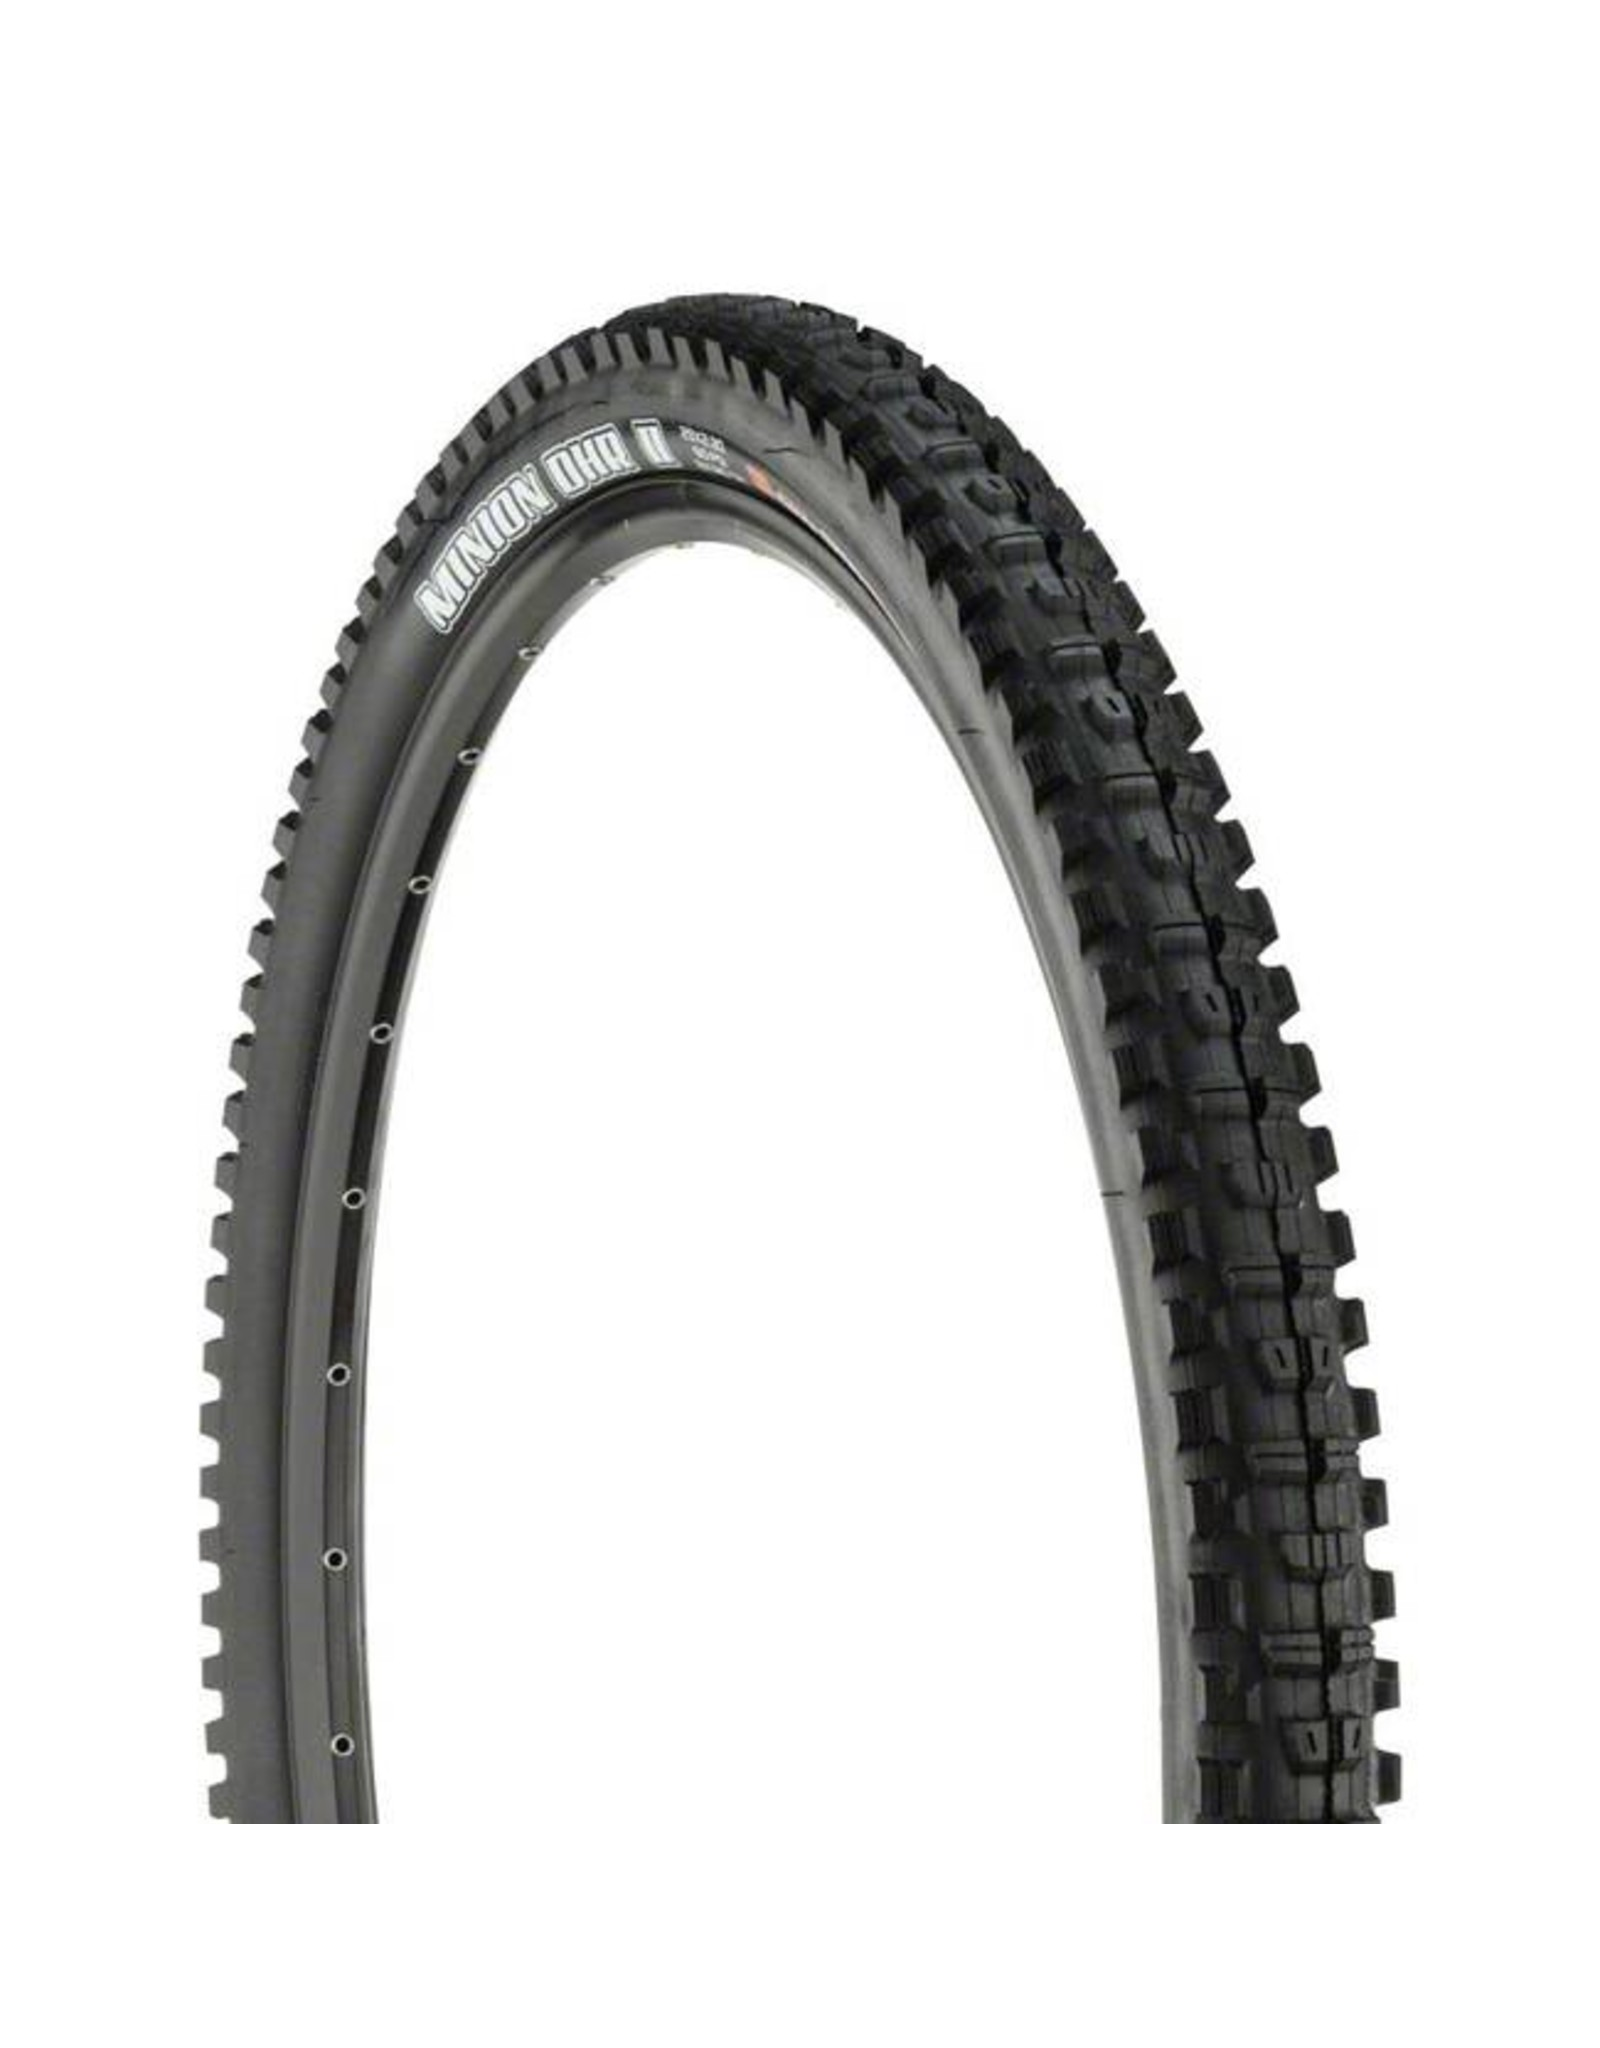 "Maxxis Maxxis Minion DHR II Tire: 29 x 2.30"", Folding, 120tpi, 3C, Double Down, Tubeless Ready, Black"